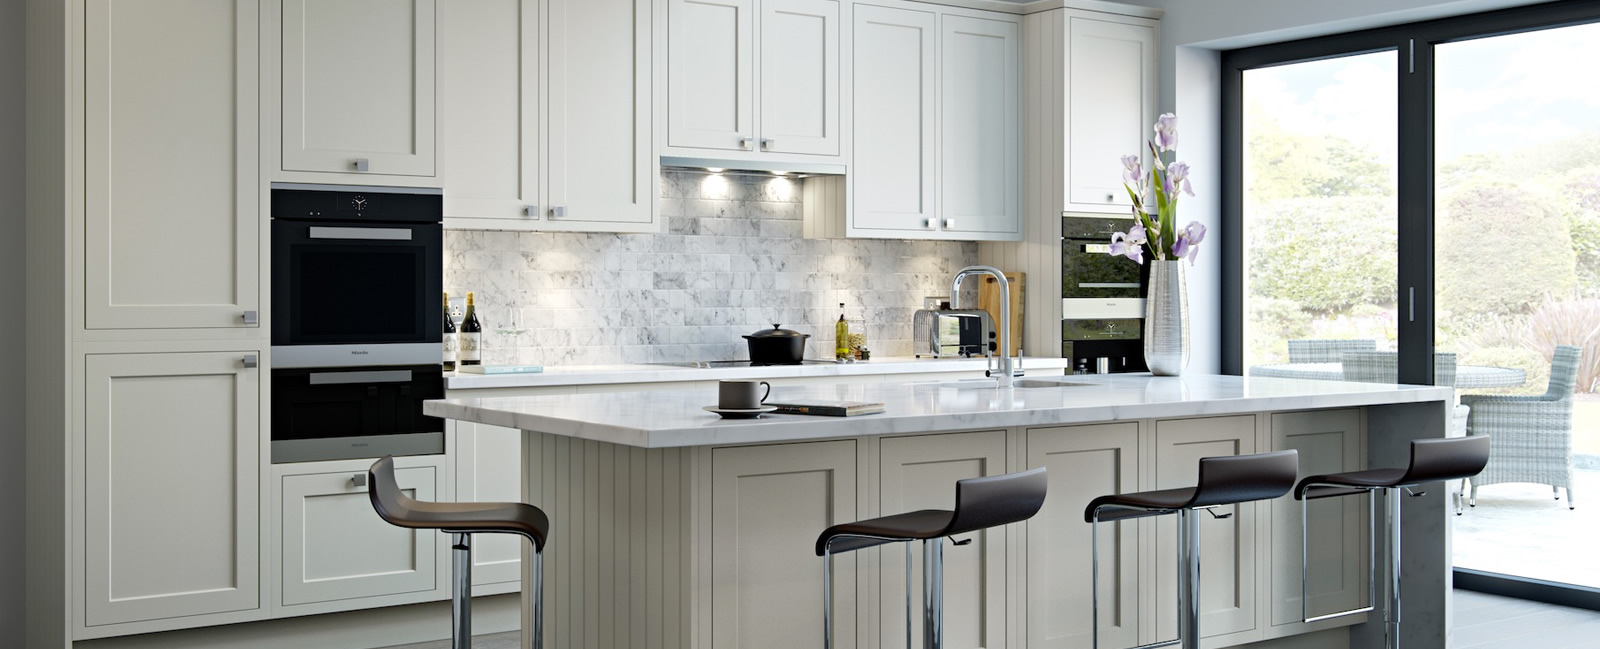 Home - Signature Kitchens